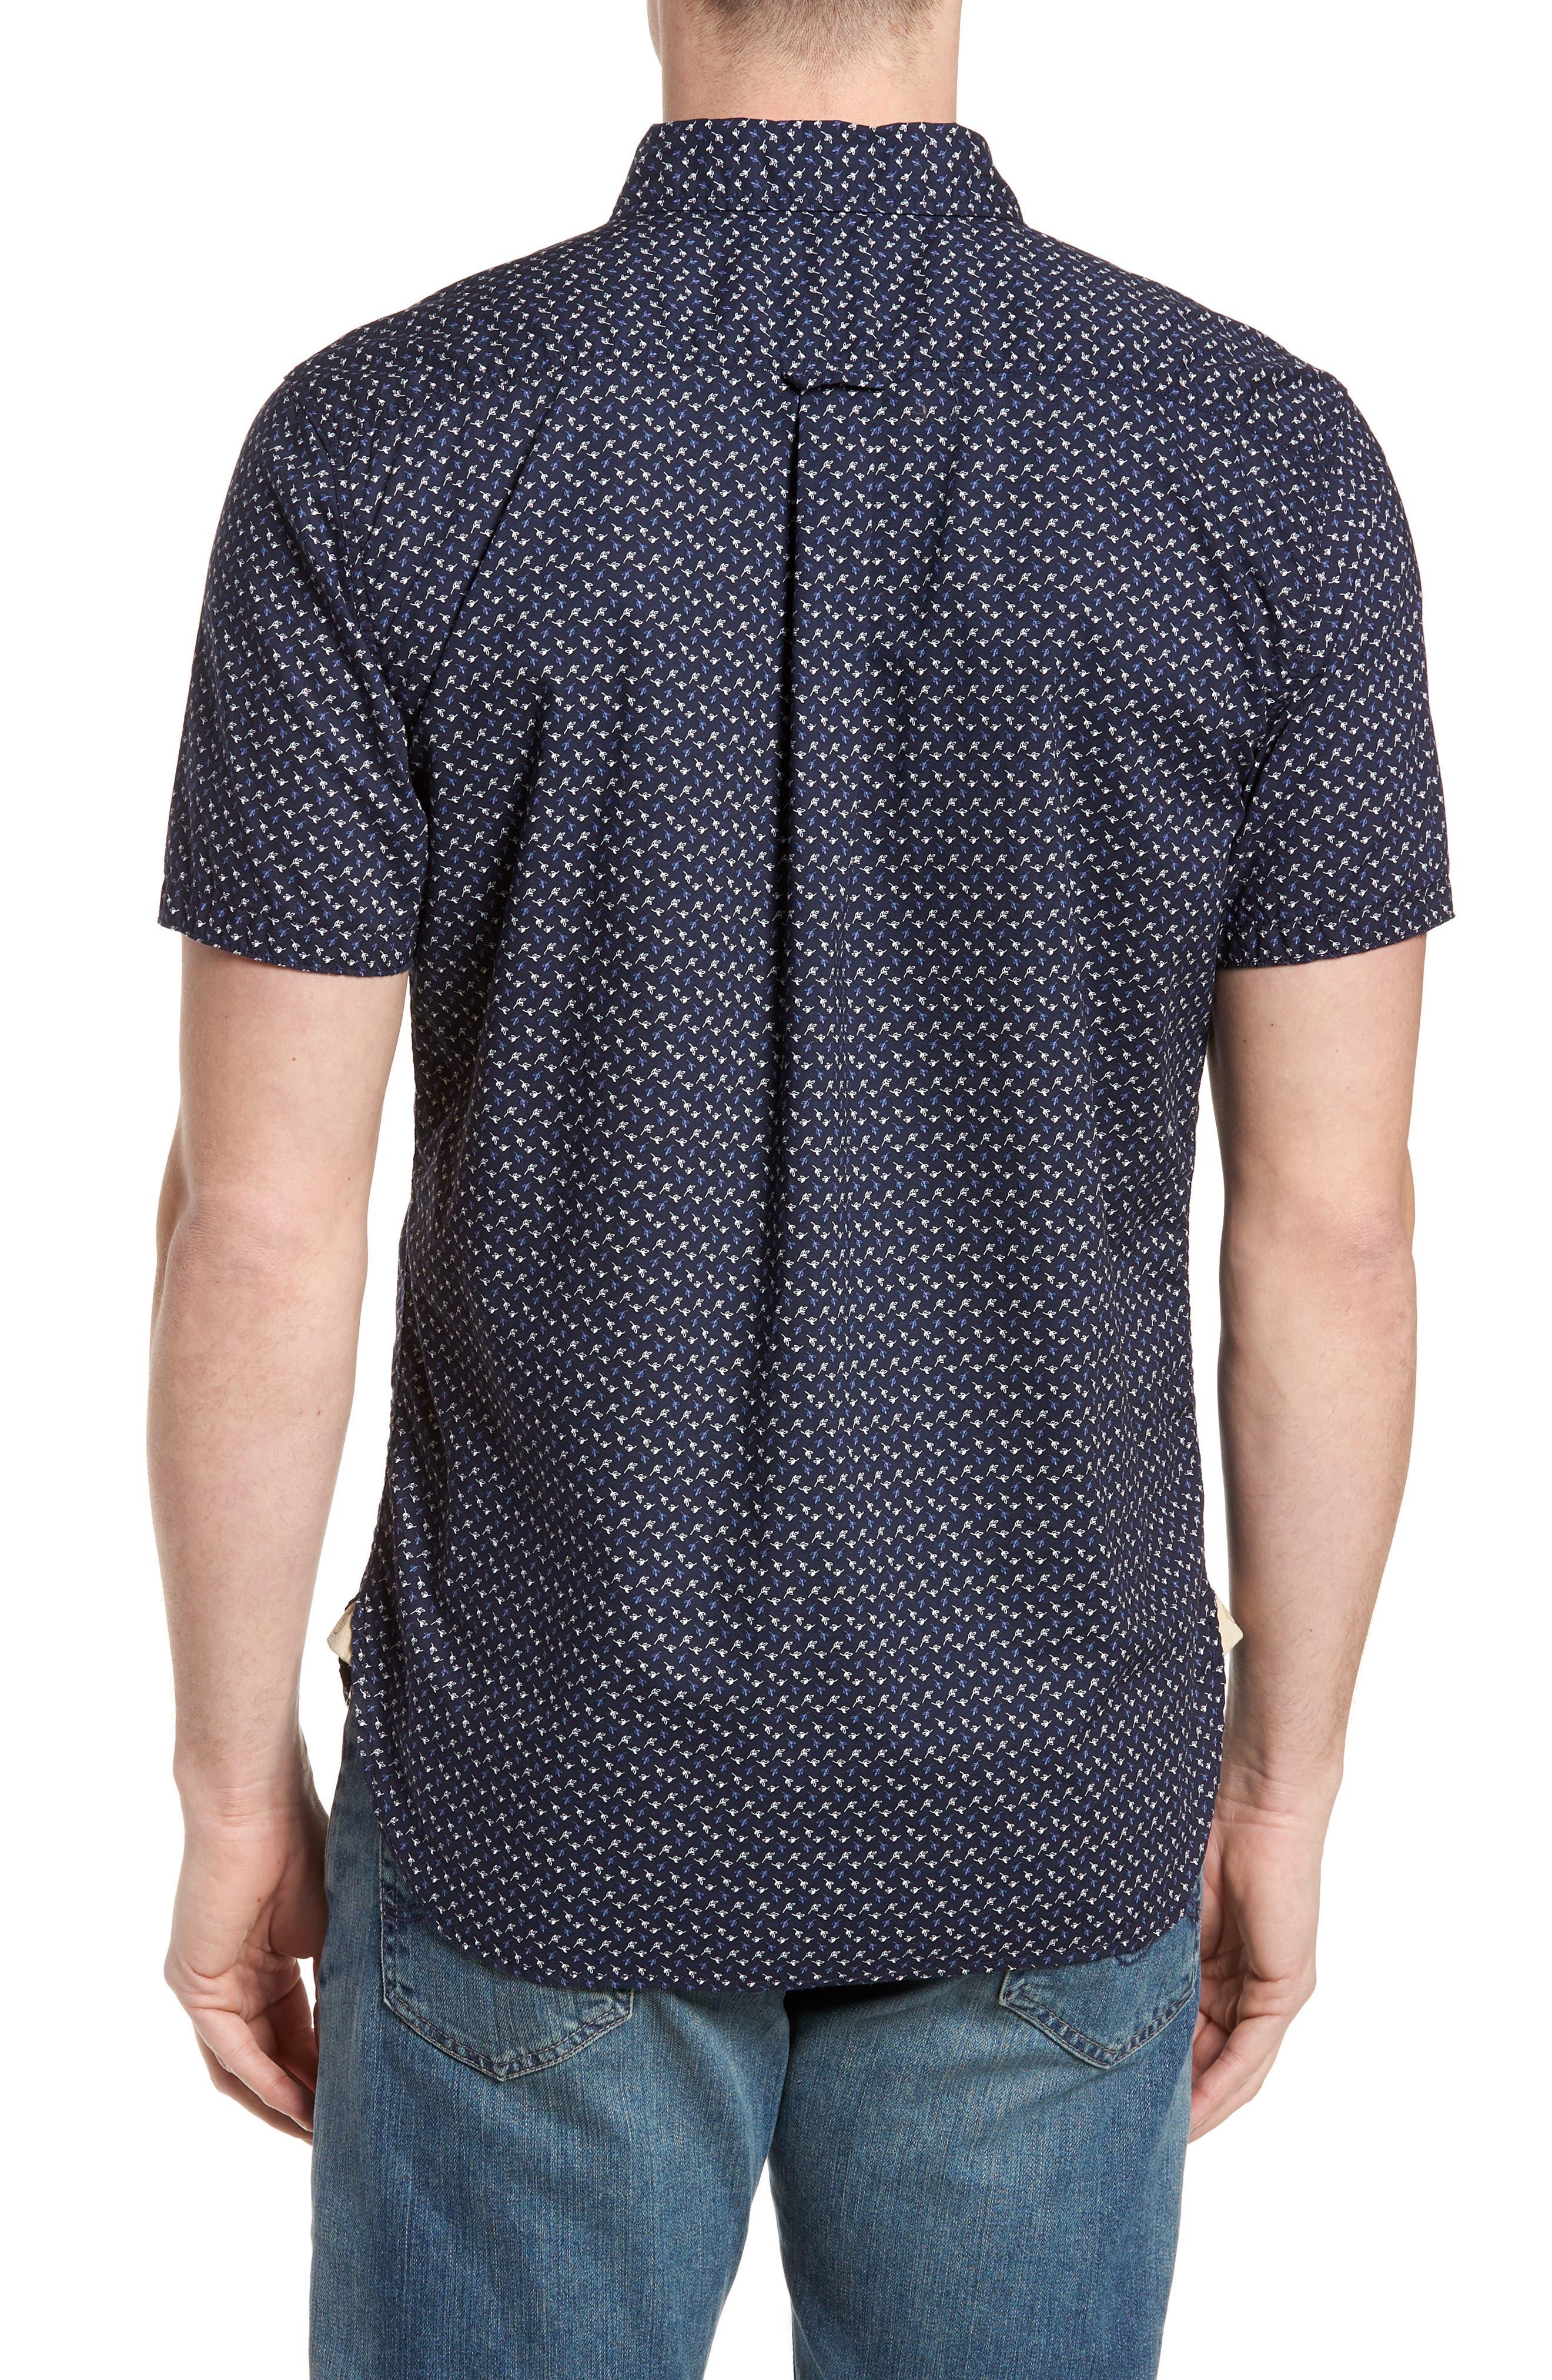 Truman Slim Fit Short Sleeve Sport Shirt,                             Alternate thumbnail 2, color,                             NAVY